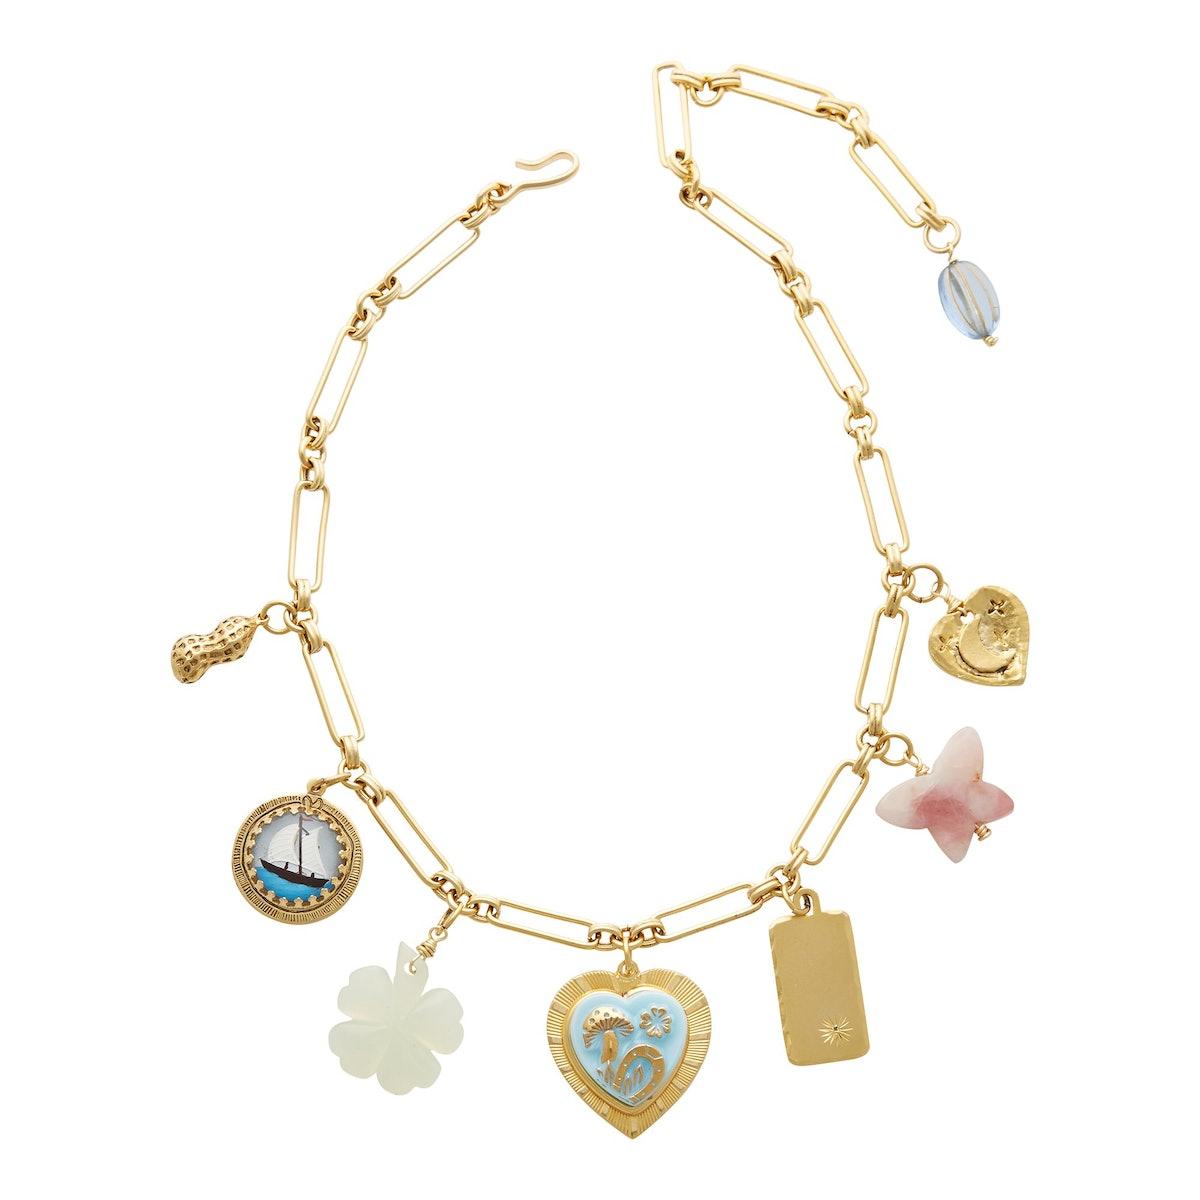 Mischief Managed Charm Necklace